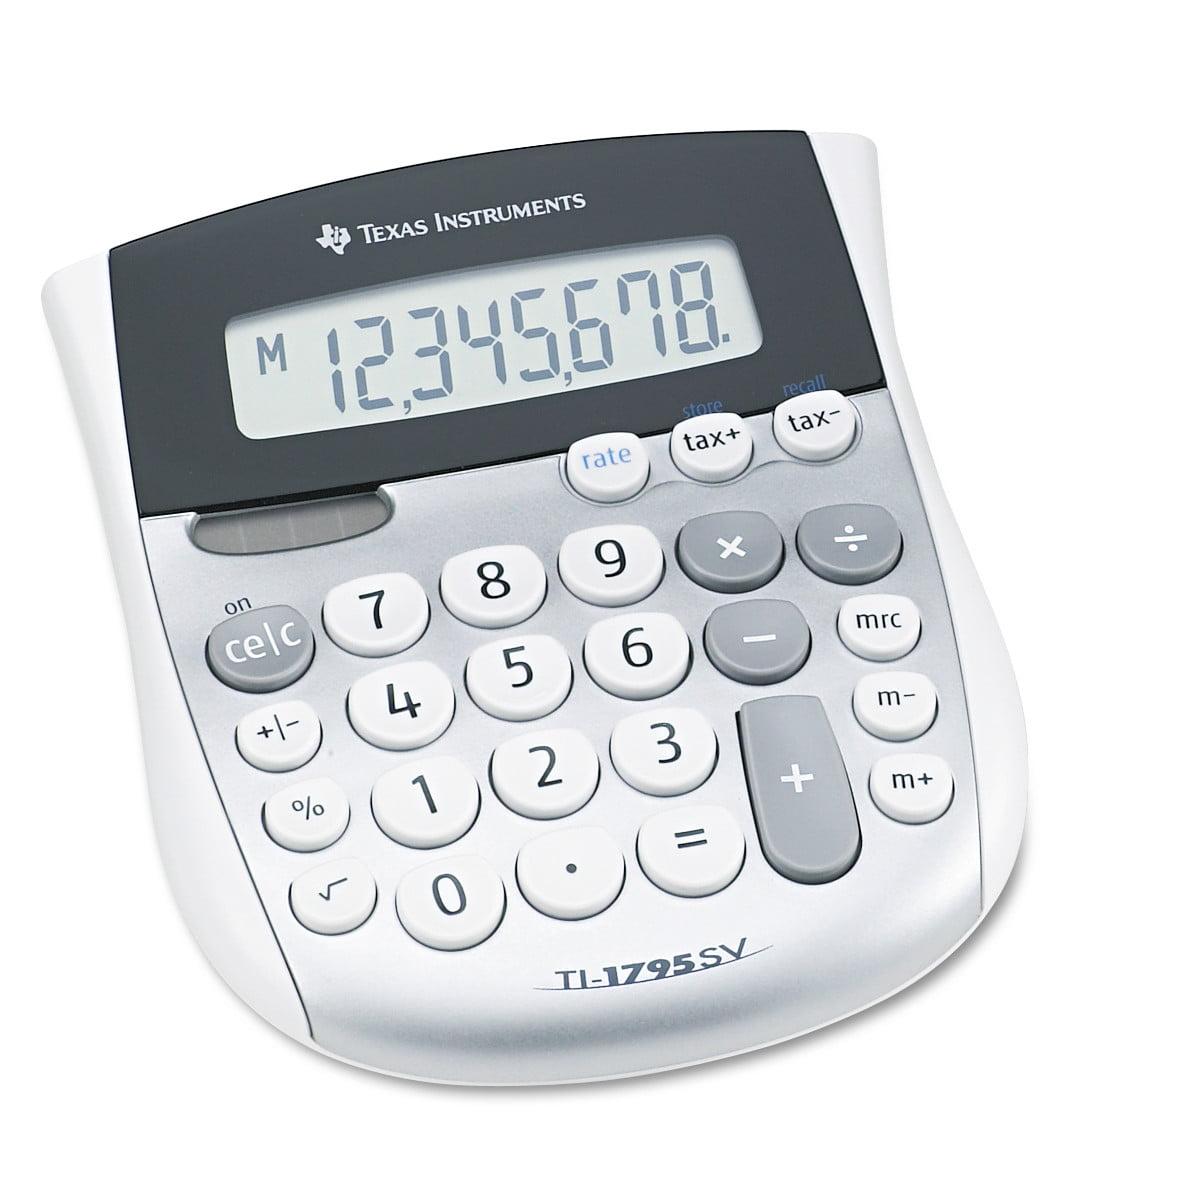 Texas Instruments Mini Desktop Calculator by Texas Instruments